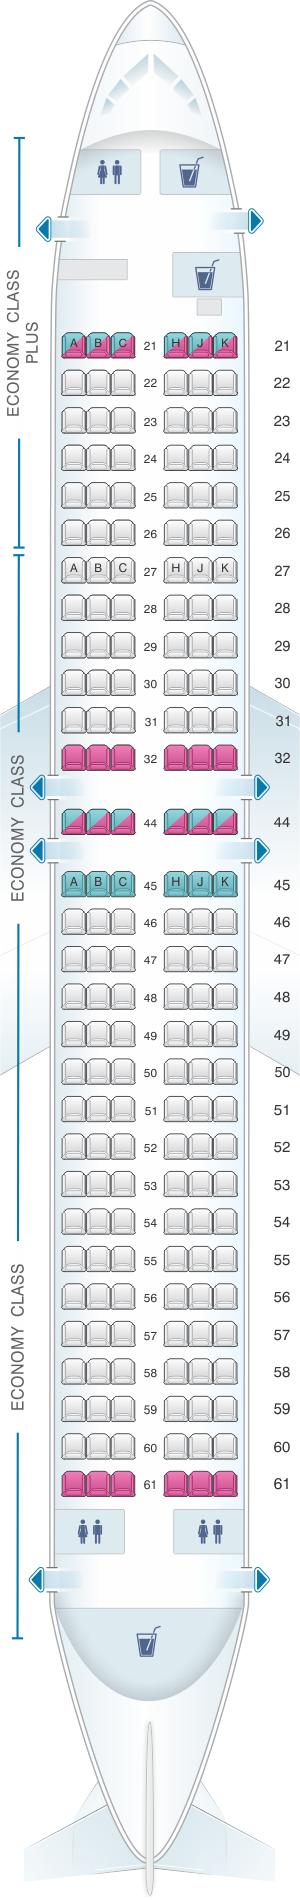 Seat map el al israel airlines boeing  pax also rh pinterest